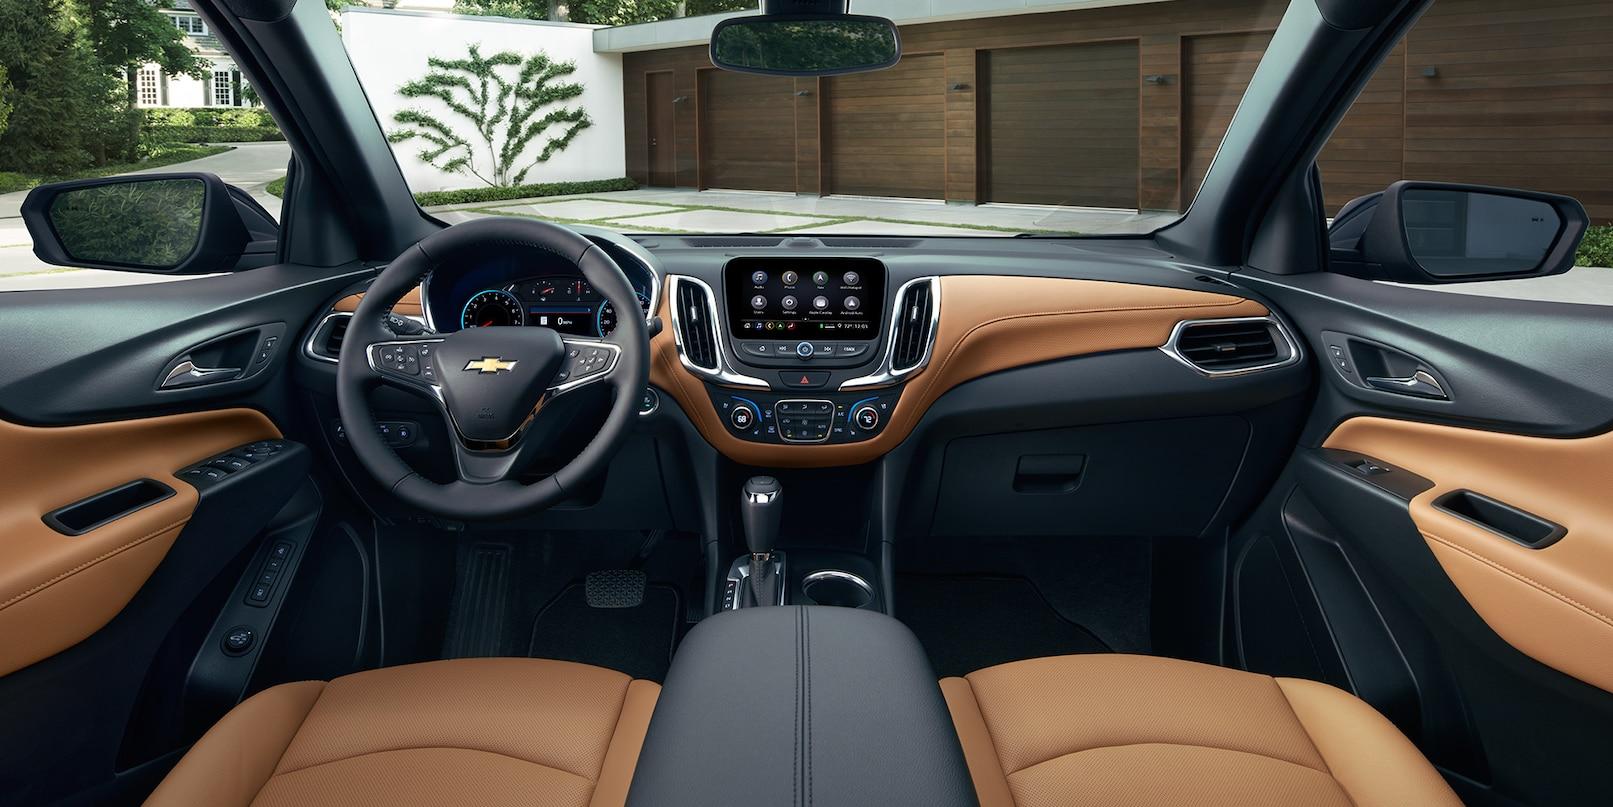 Interior of the 2019 Chevrolet Equinox